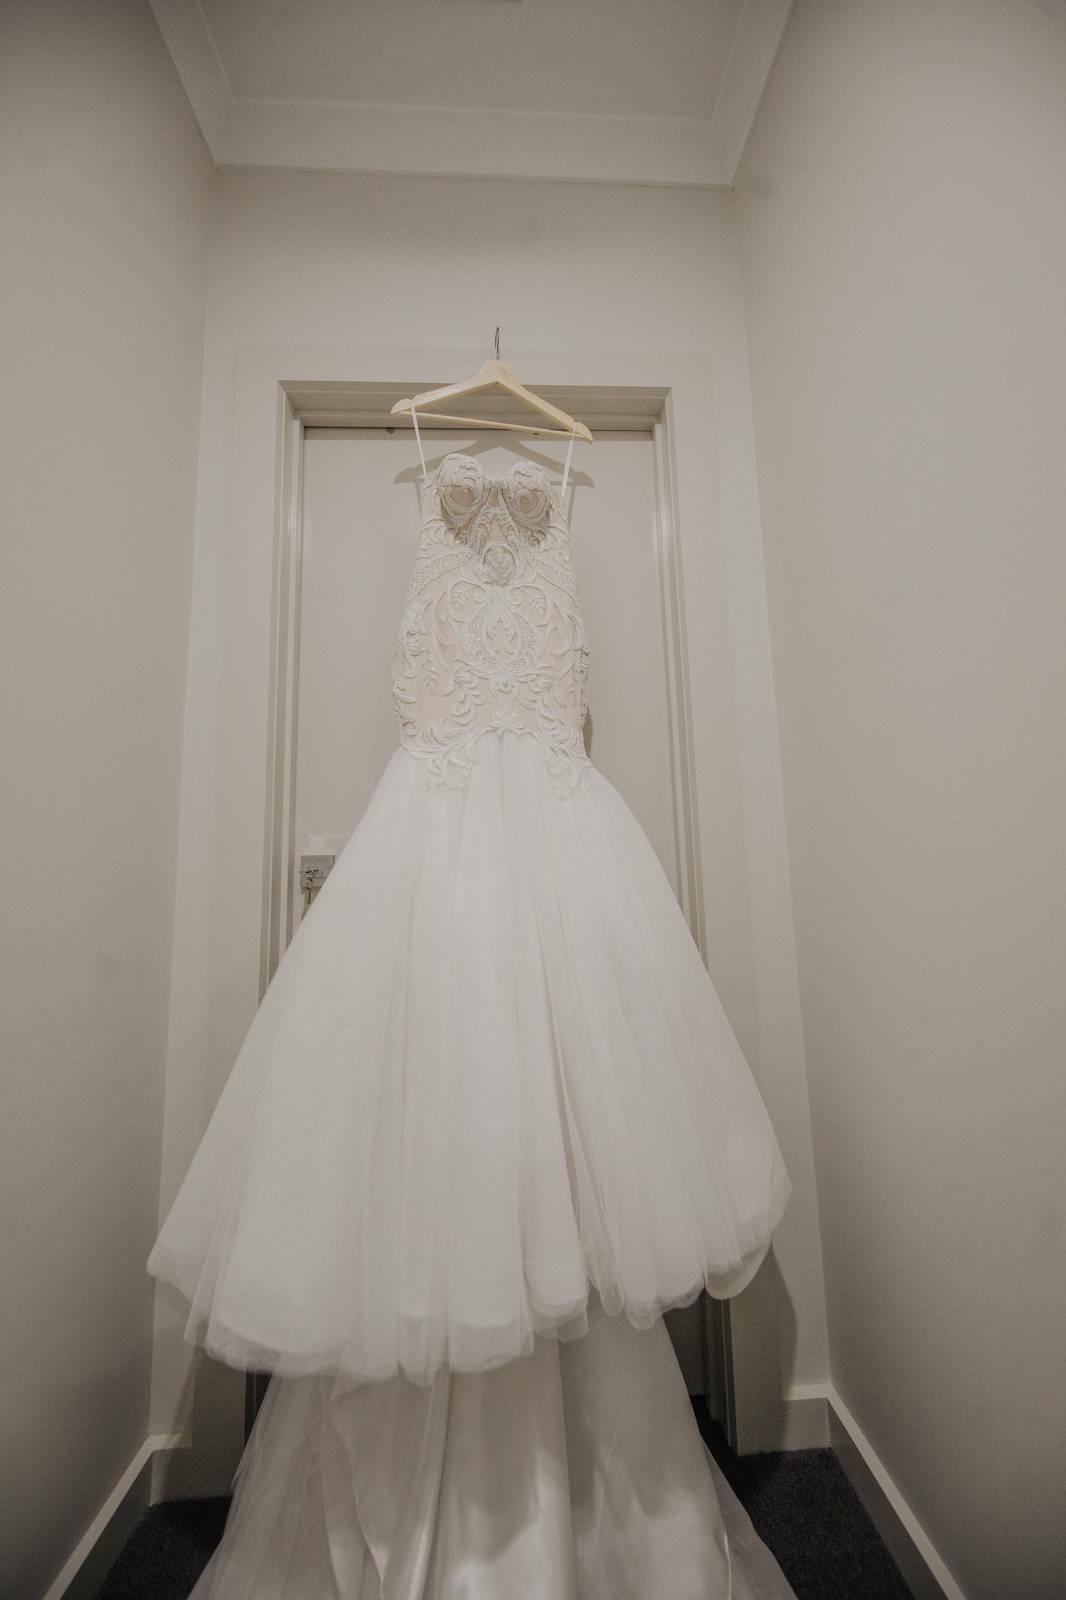 Craig Braybrook wedding dress